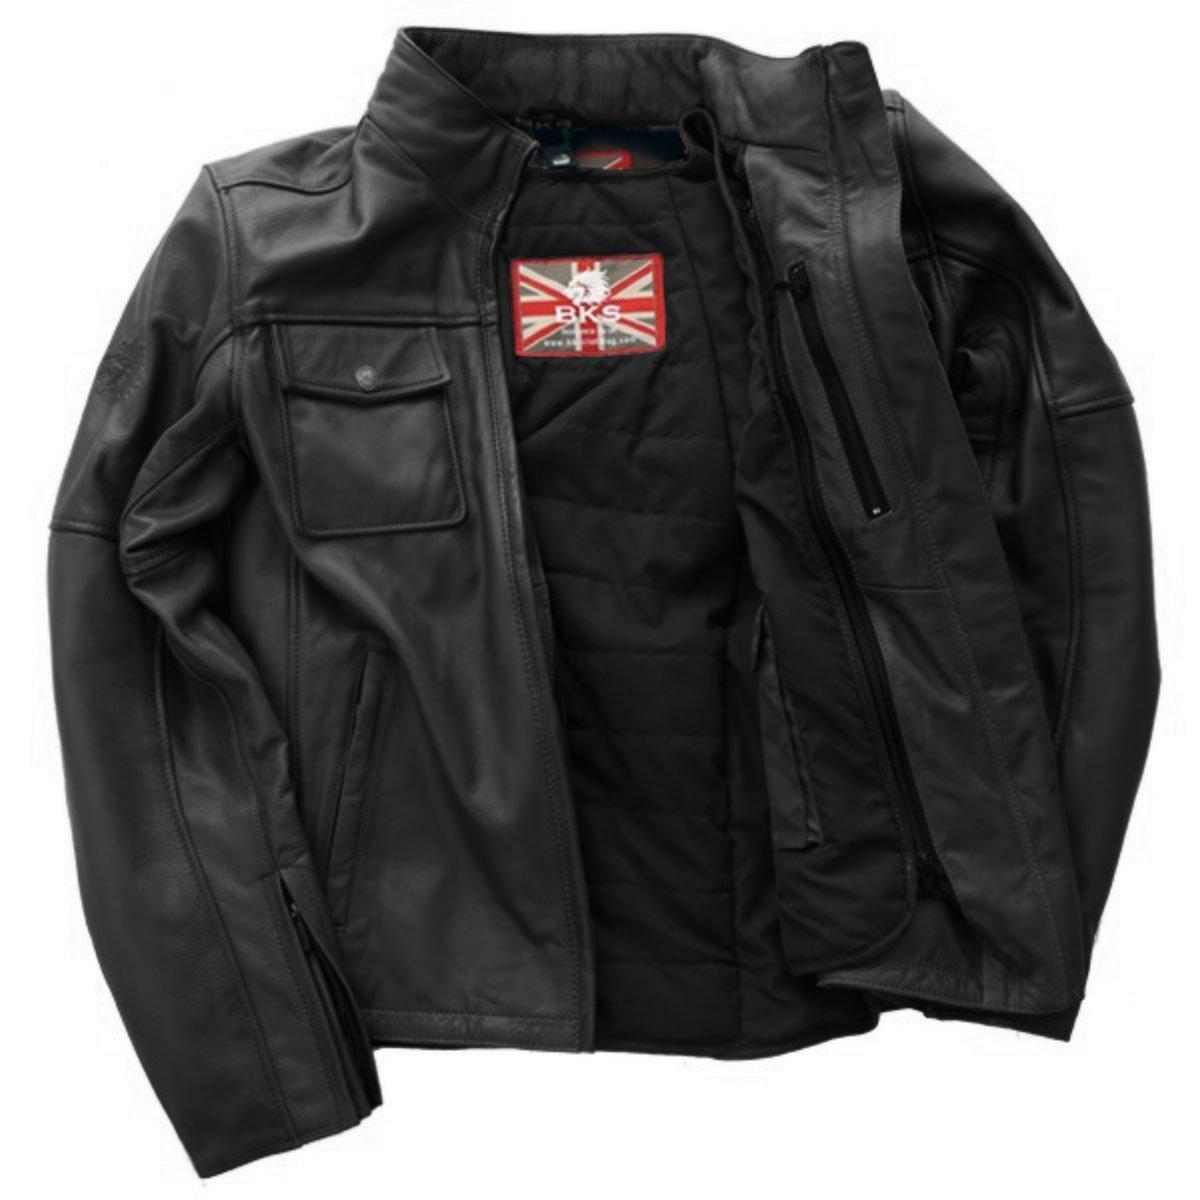 BKS Brandy Mens Black Leather Motorcycle Jacket Inside